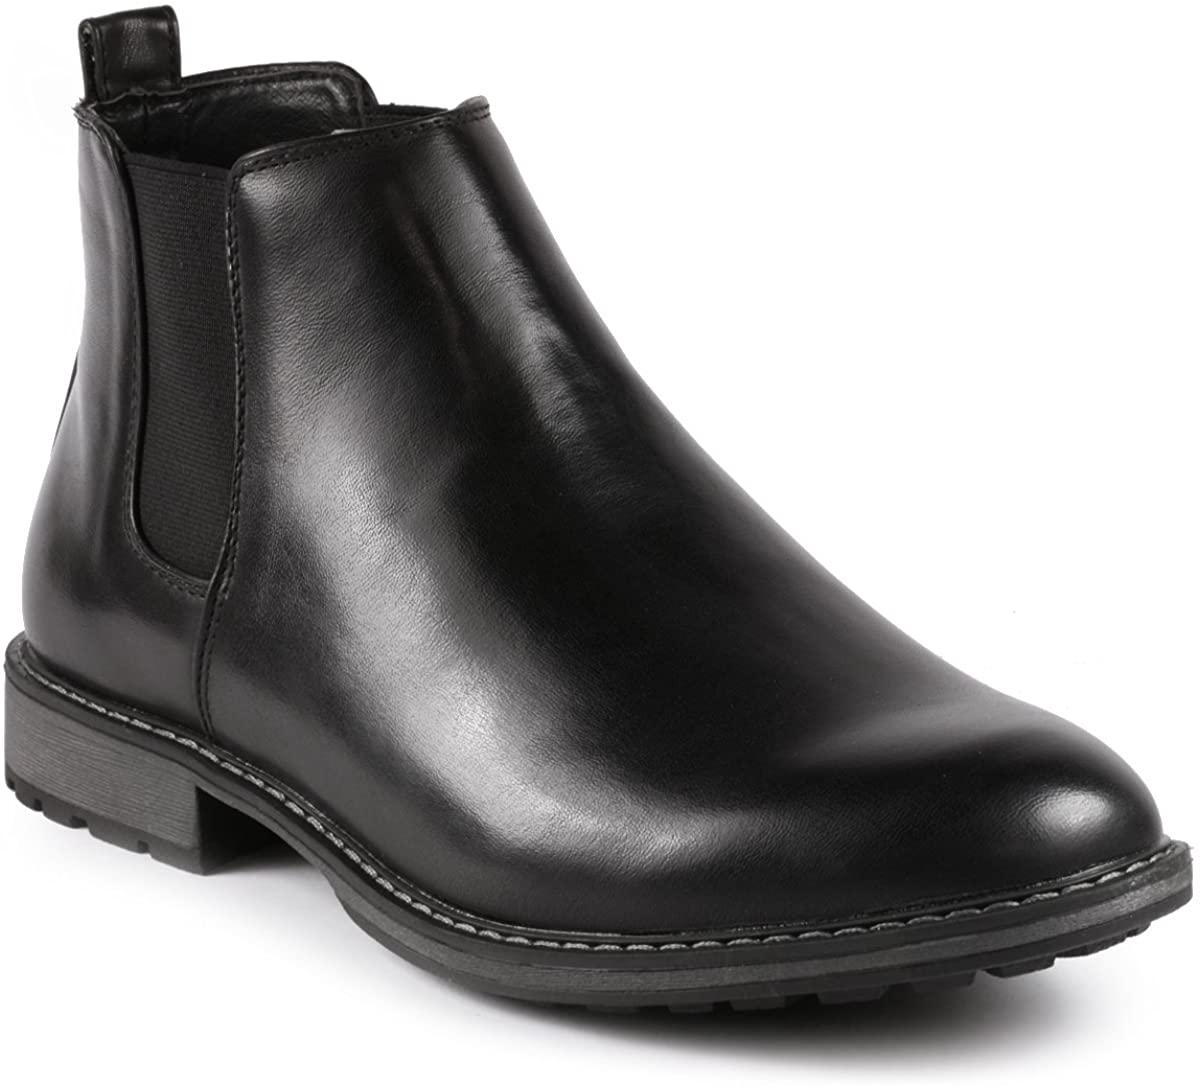 Metrocharm MC137 Men's Formal Dress Chelsea Ankle Boot